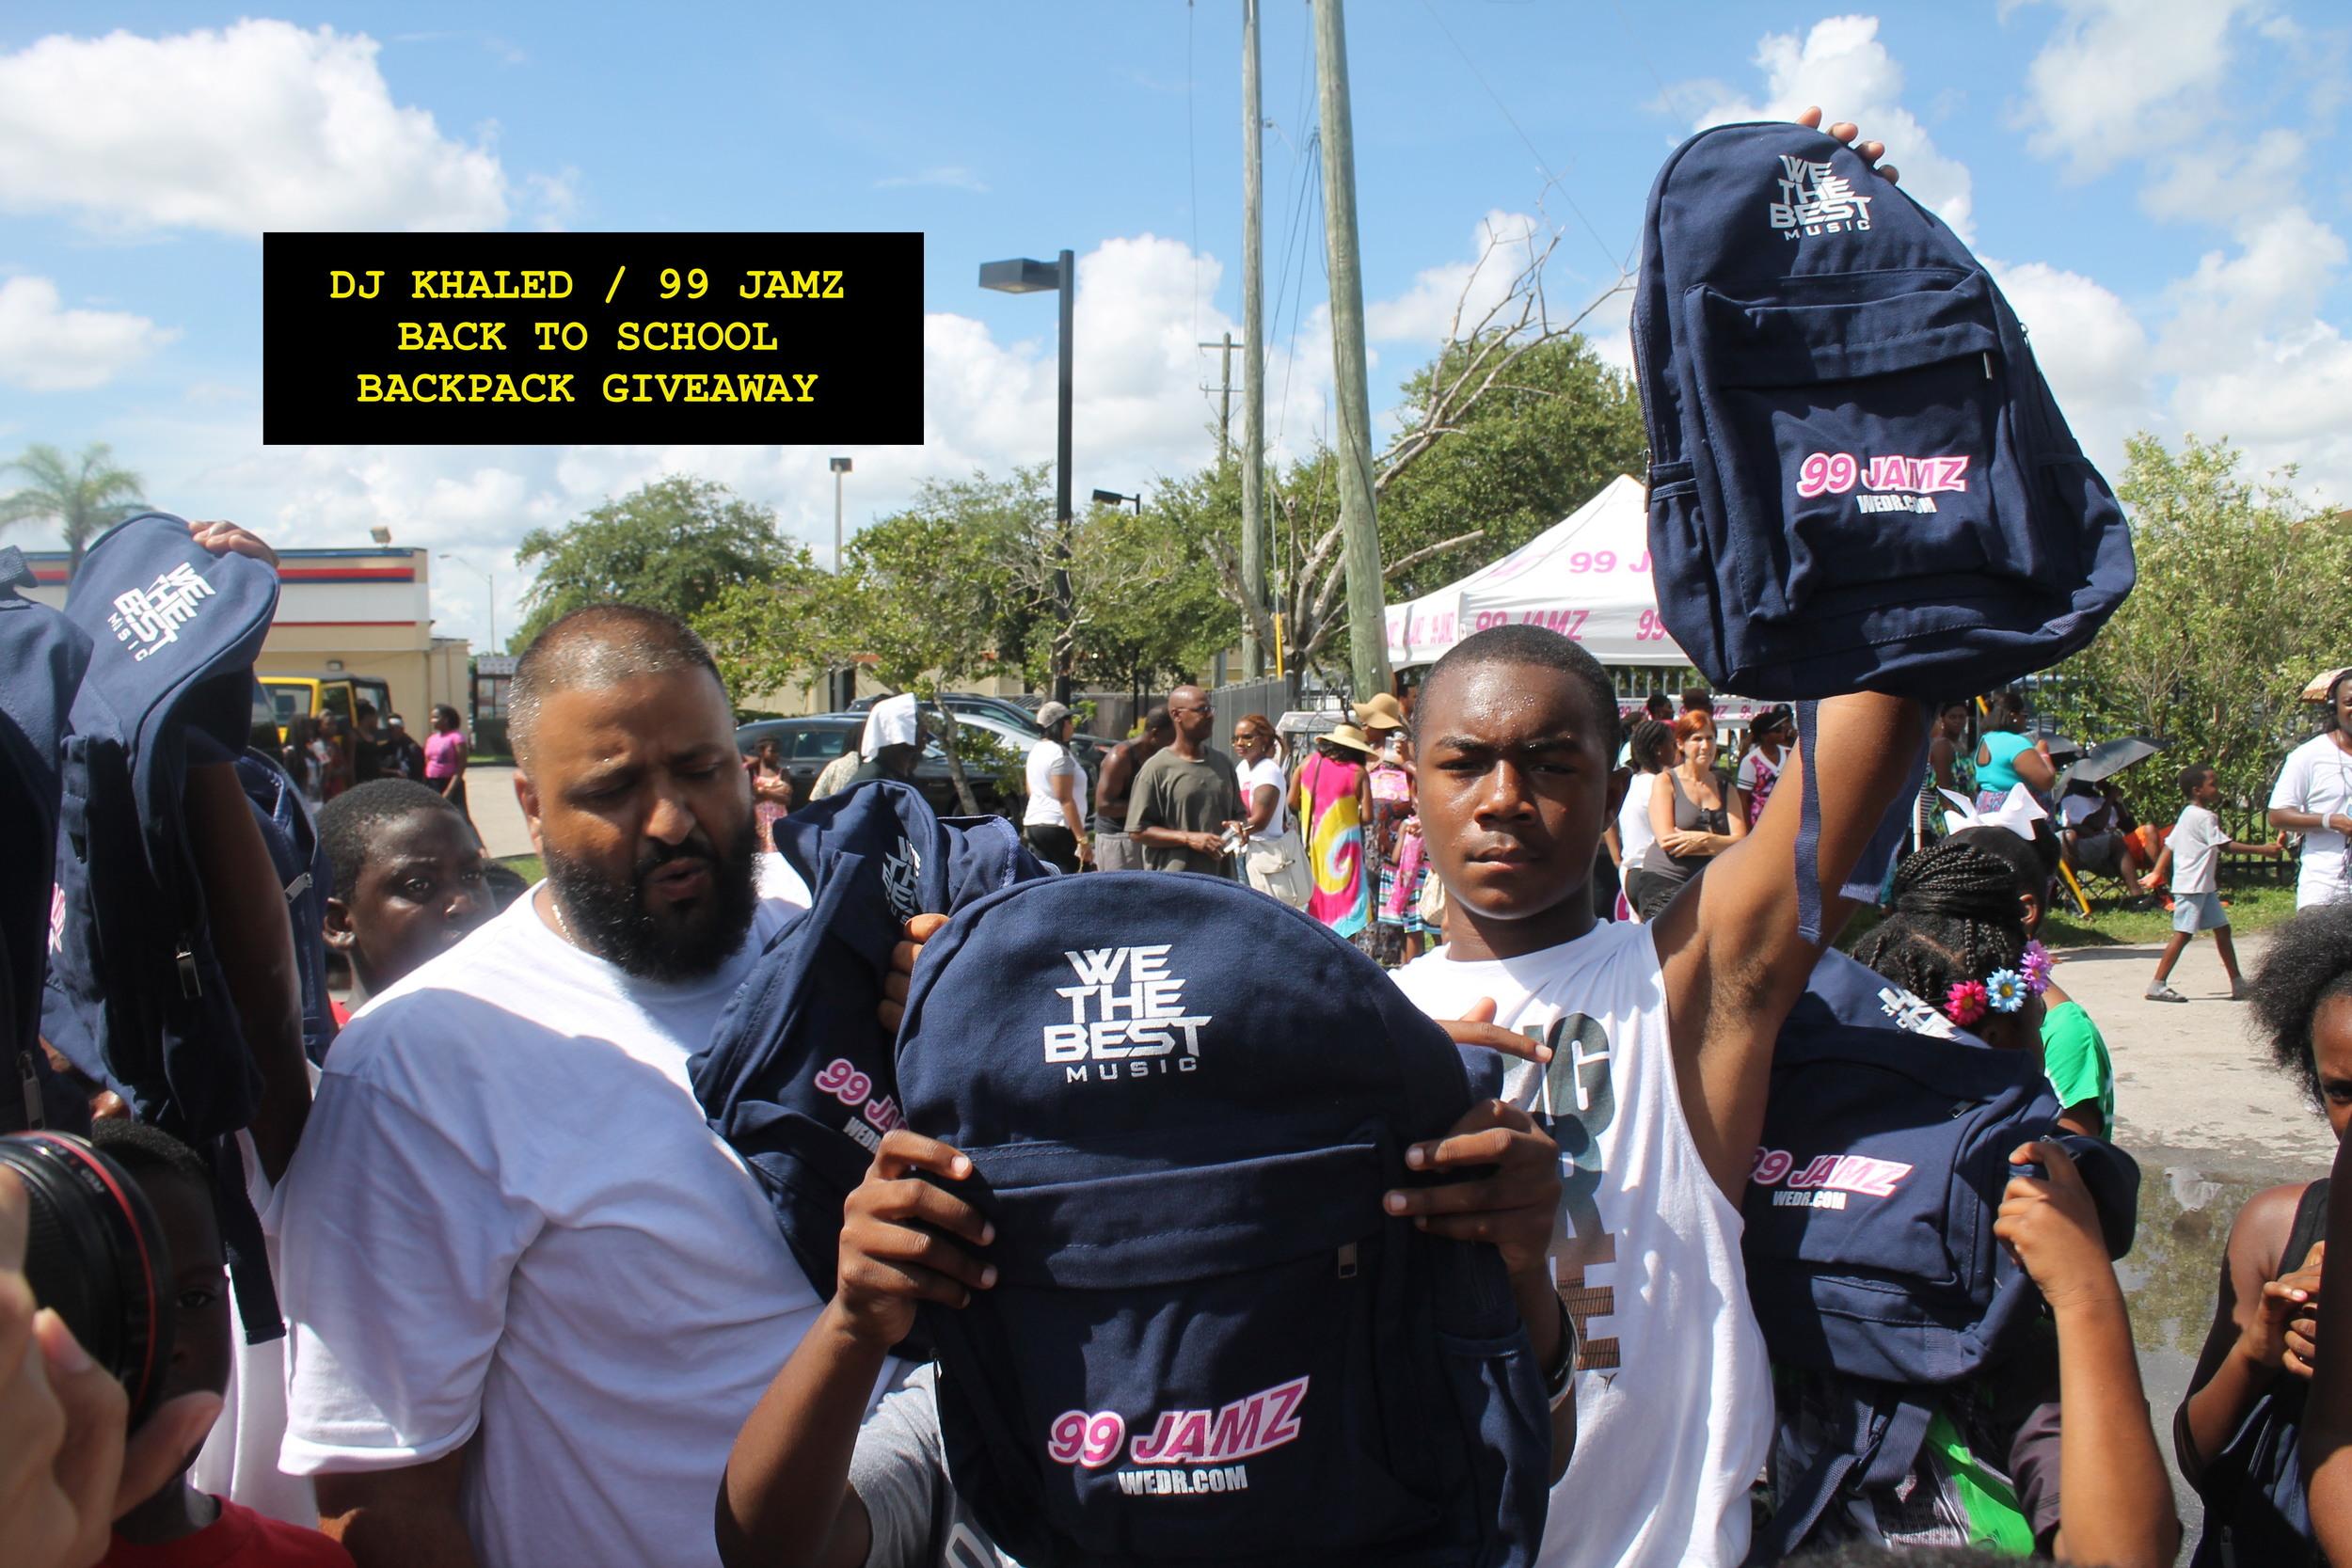 Khaled 99jamz backpack TEXT.JPG